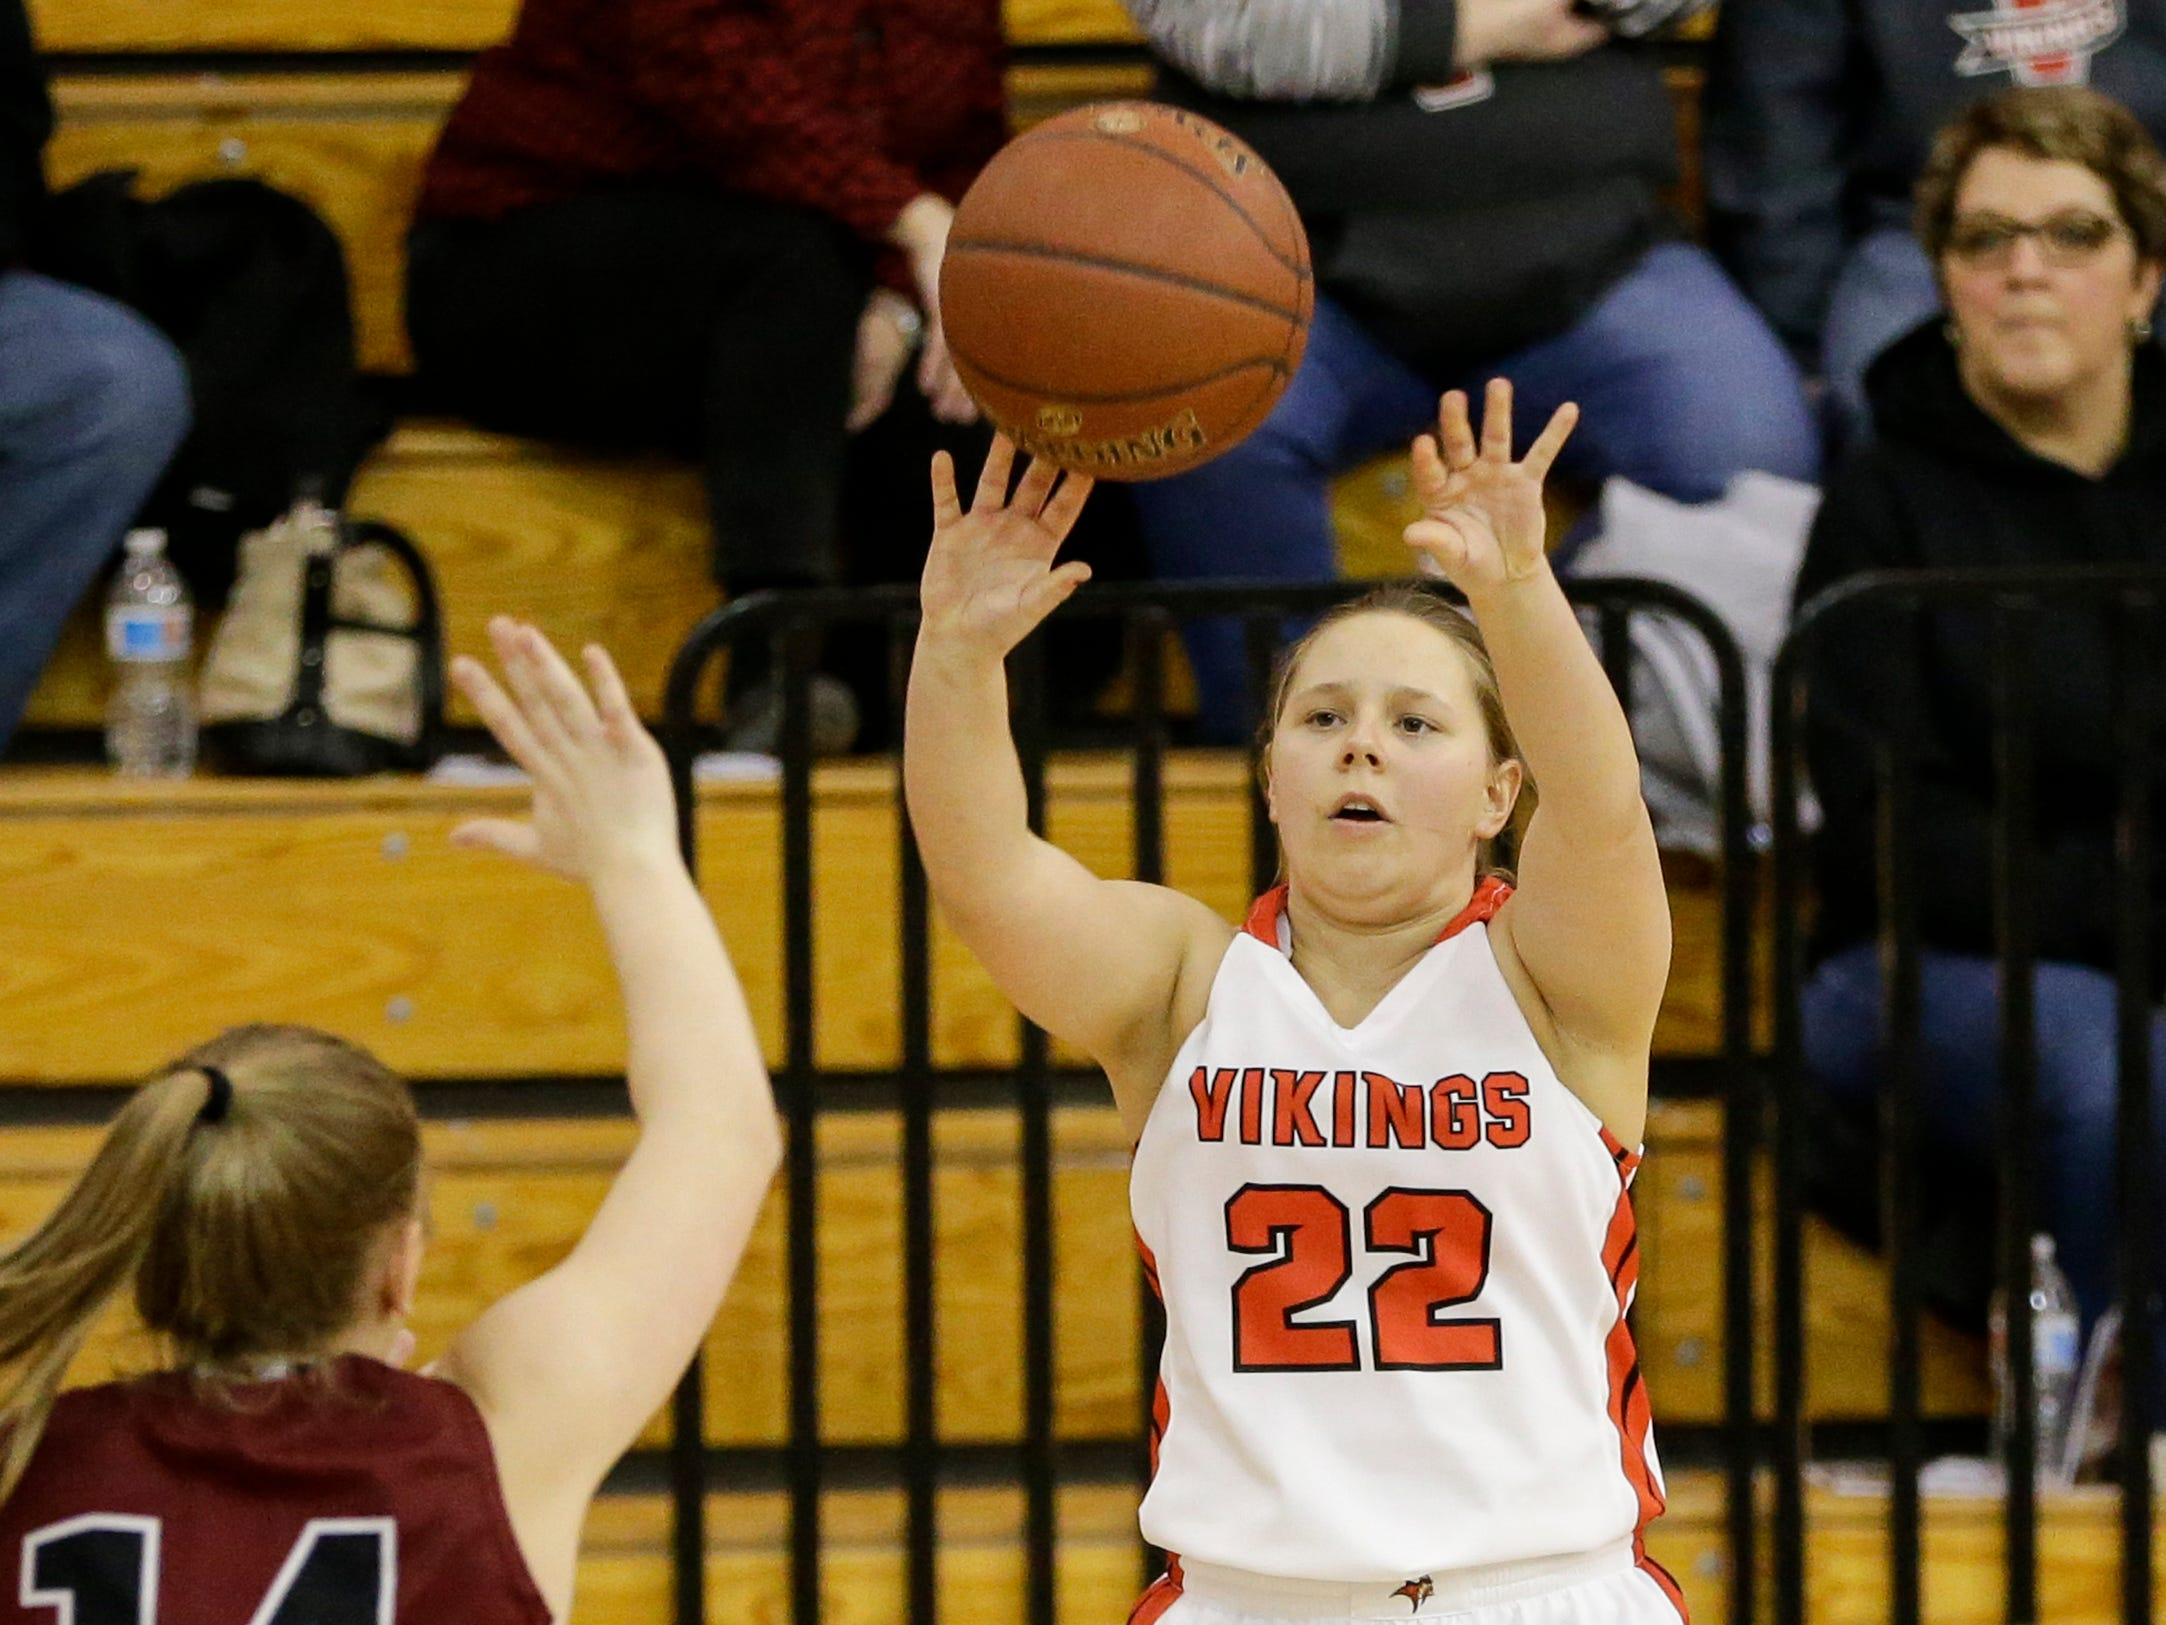 Valders' Lindsey Brunmeier (22) shoots against New Holstein at Valders High School Friday, February 8, 2019, in Valders, Wis. Joshua Clark/USA TODAY NETWORK-Wisconsin